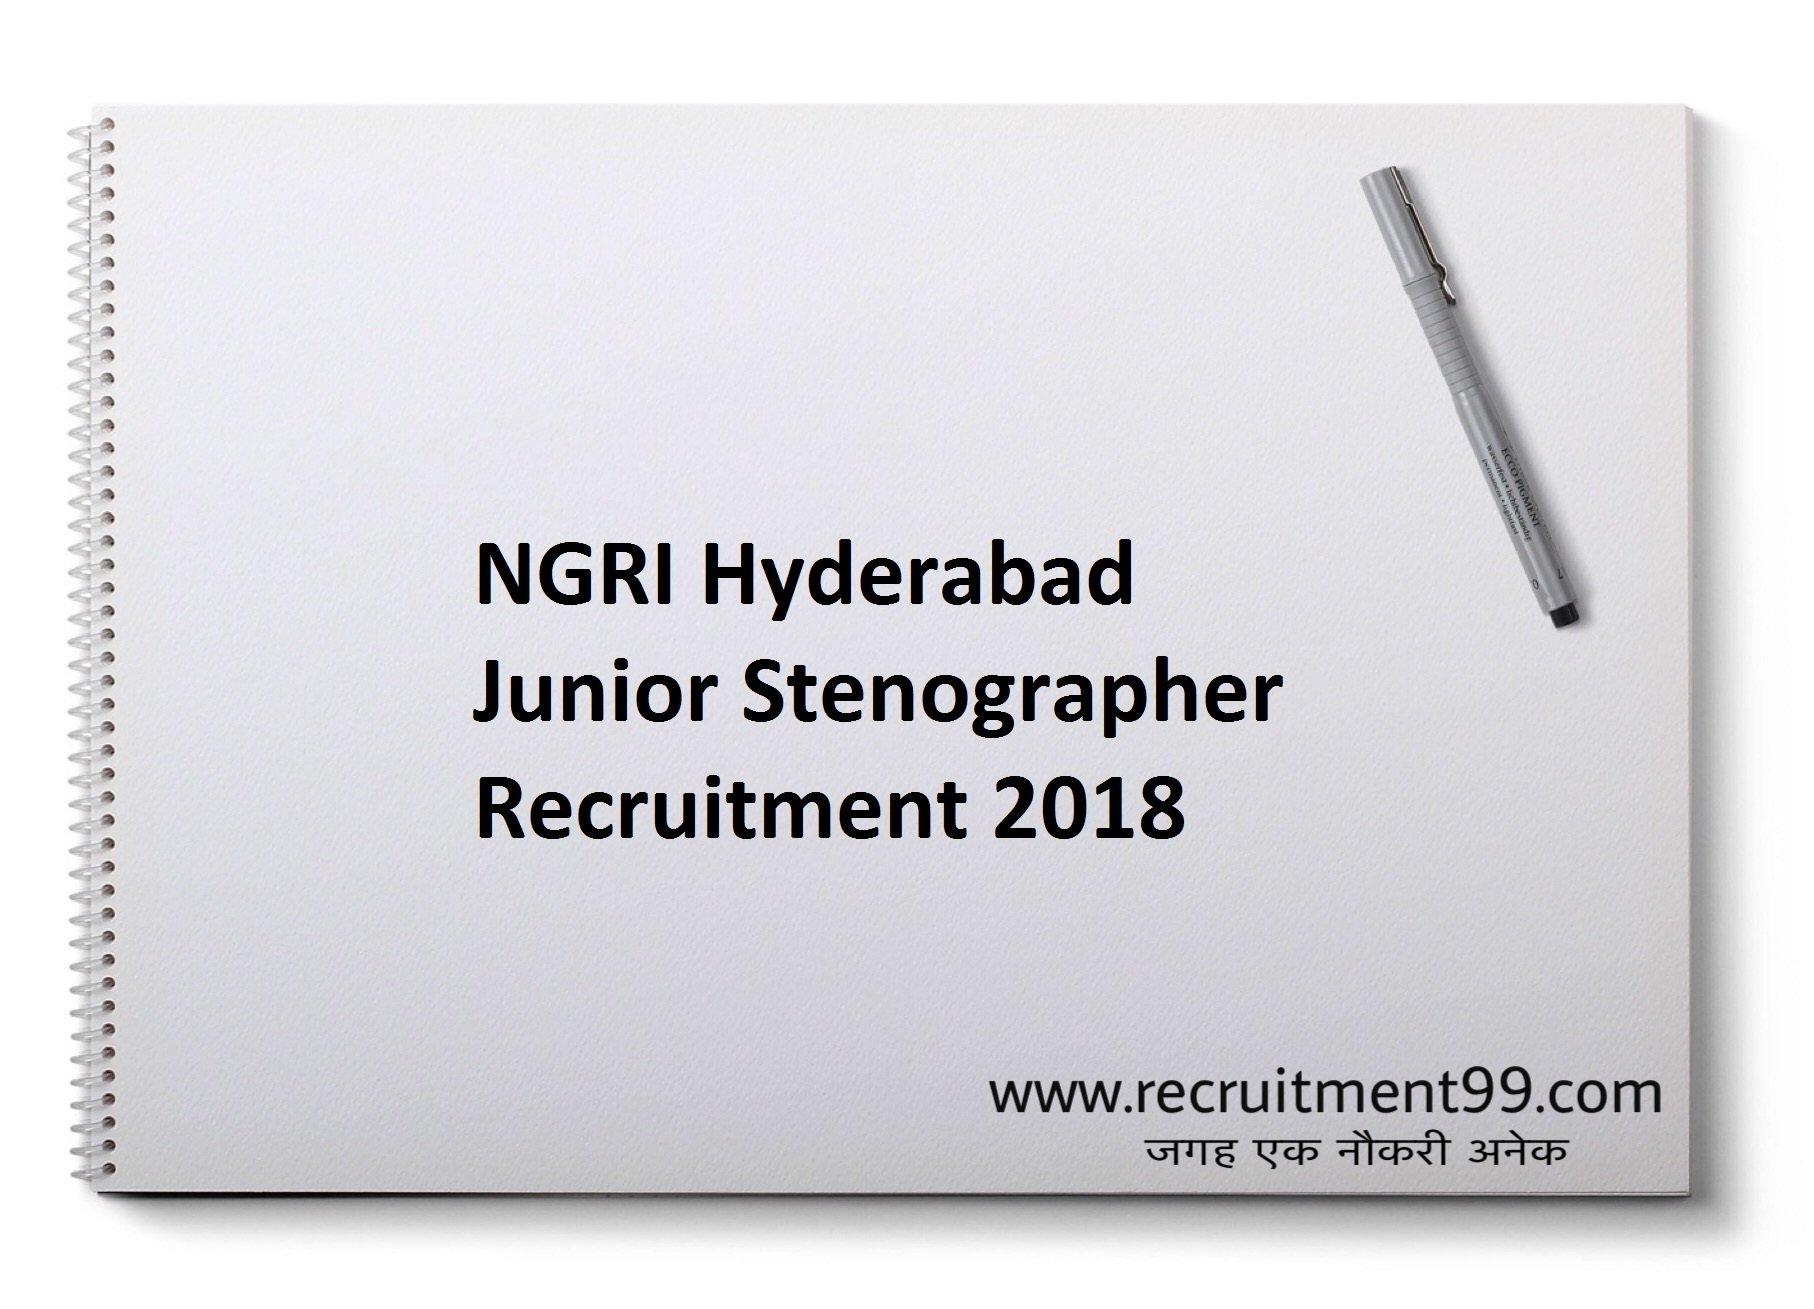 NGRI Hyderabad Junior Stenographer Recruitment Admit Card Result 2018